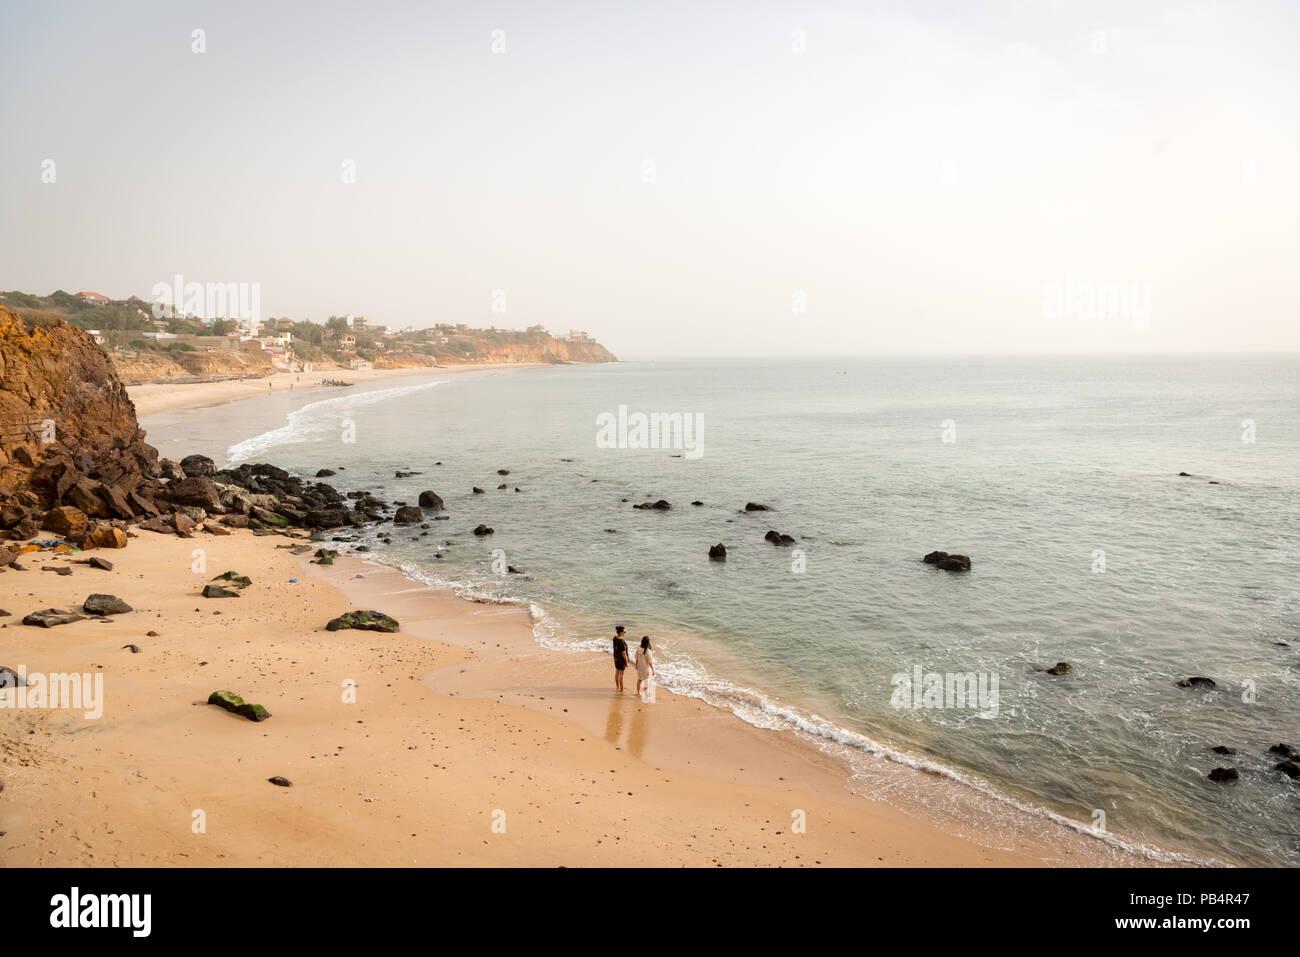 The beach at Toubab Diaolao, Senegal - Stock Image